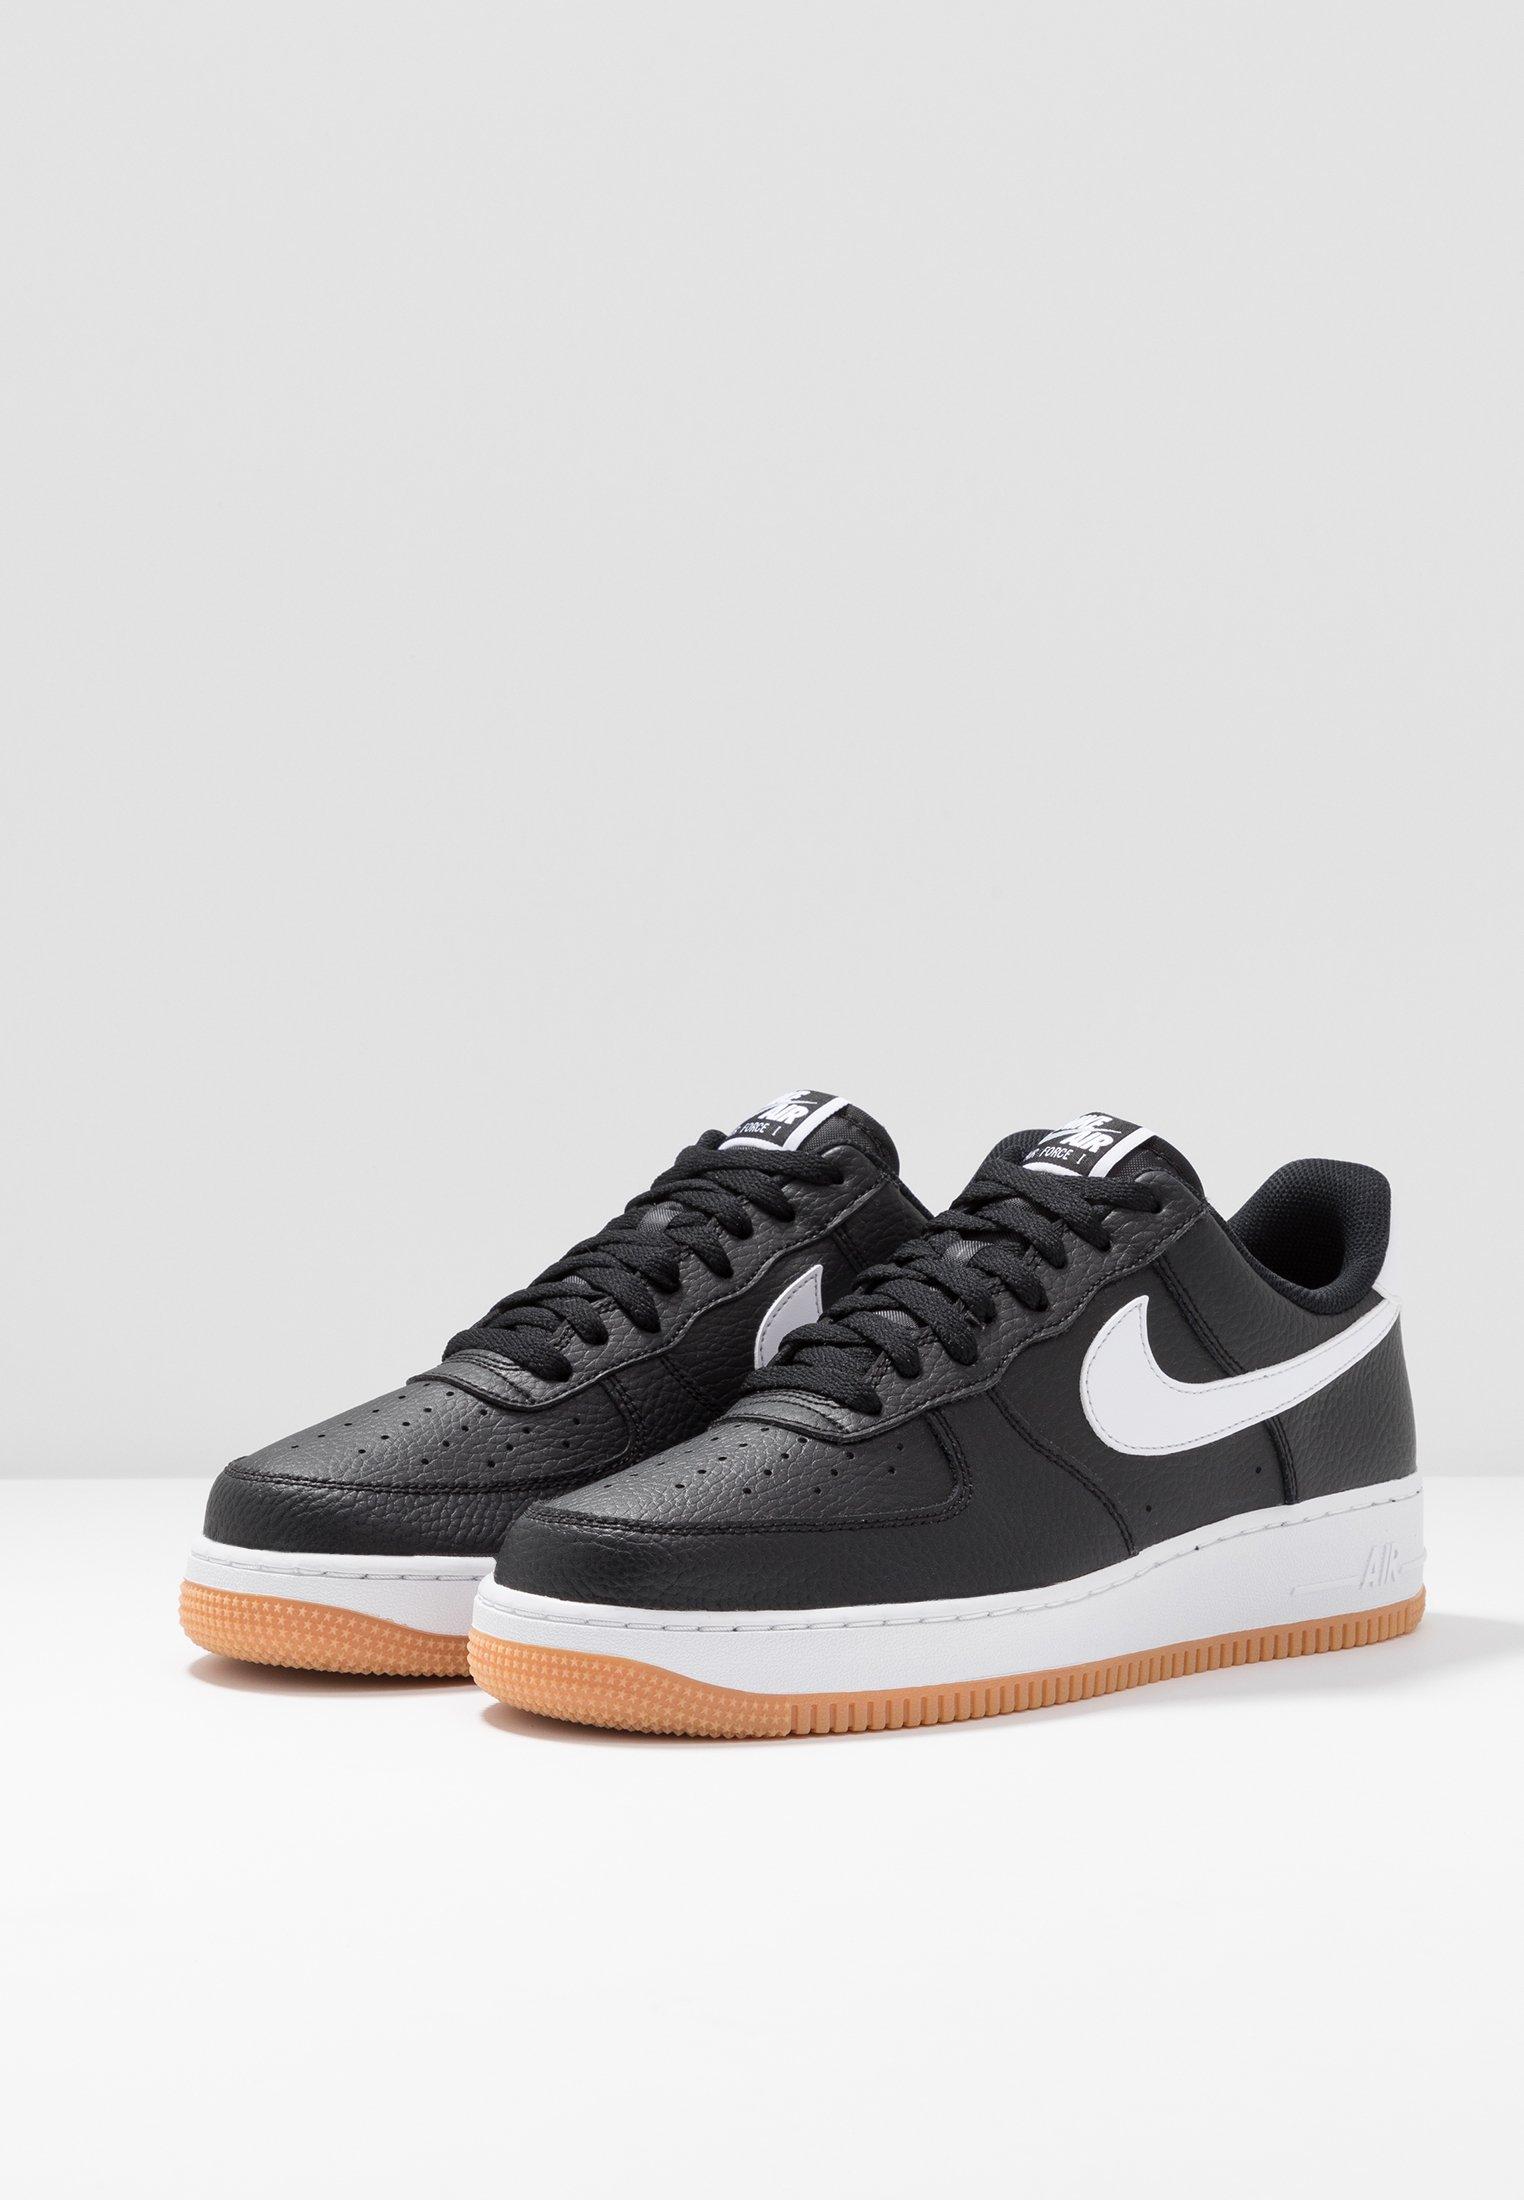 white Nike Black 1 '07Baskets medium wolf Sportswear Air Force Basses Brown Grey TFKl1J3c